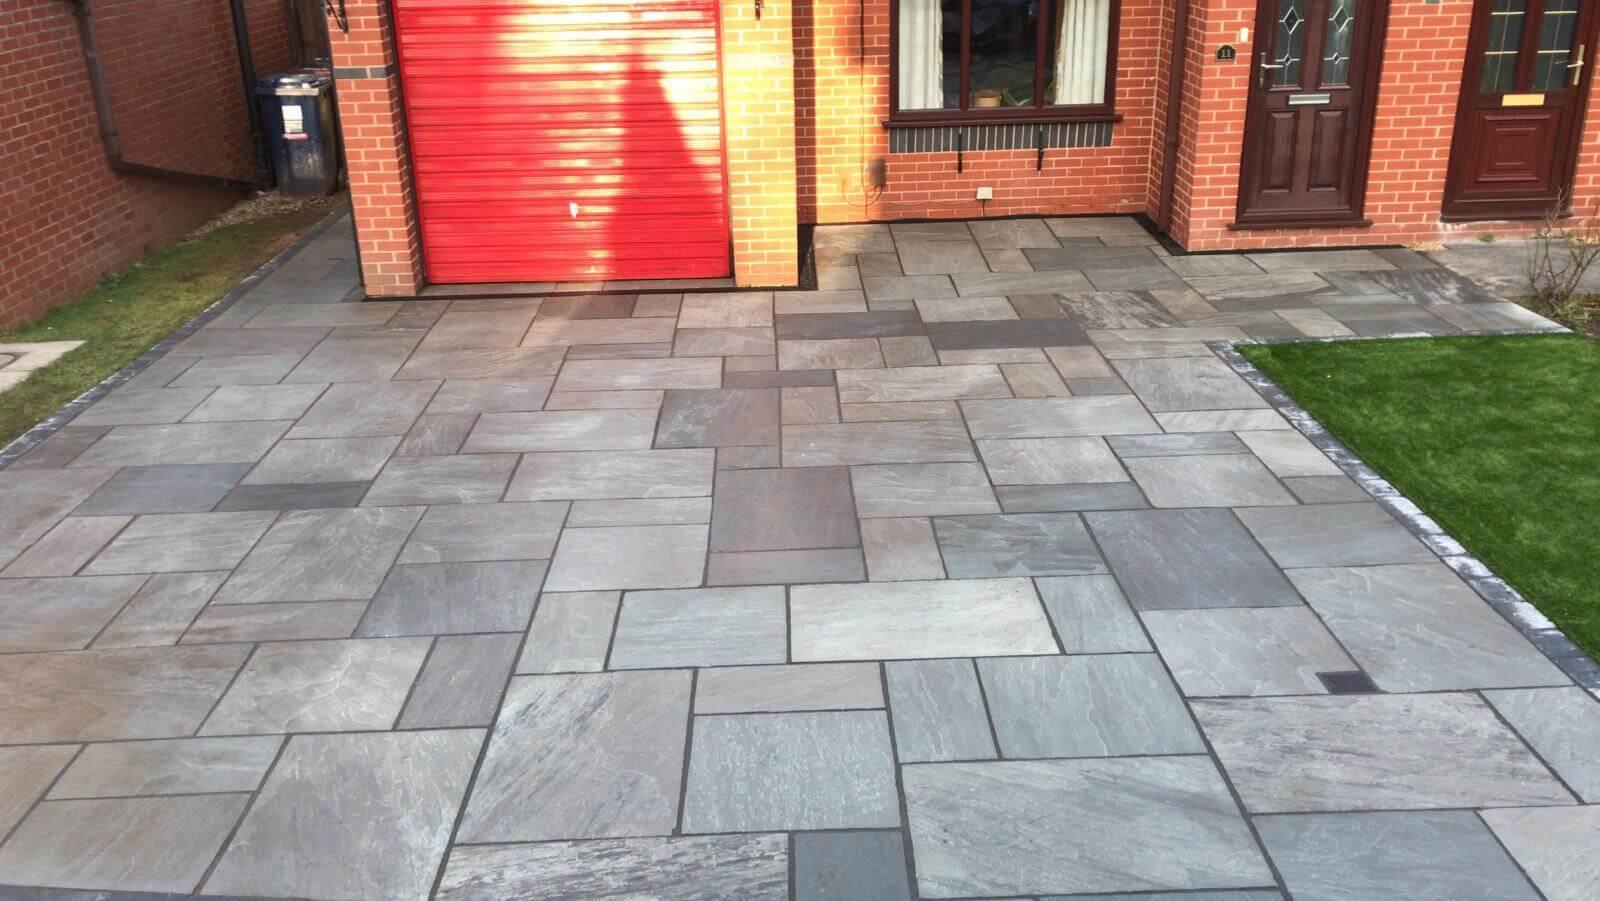 Indian sand stone driveway installed in Lostock hall Lancashire Tegula block border